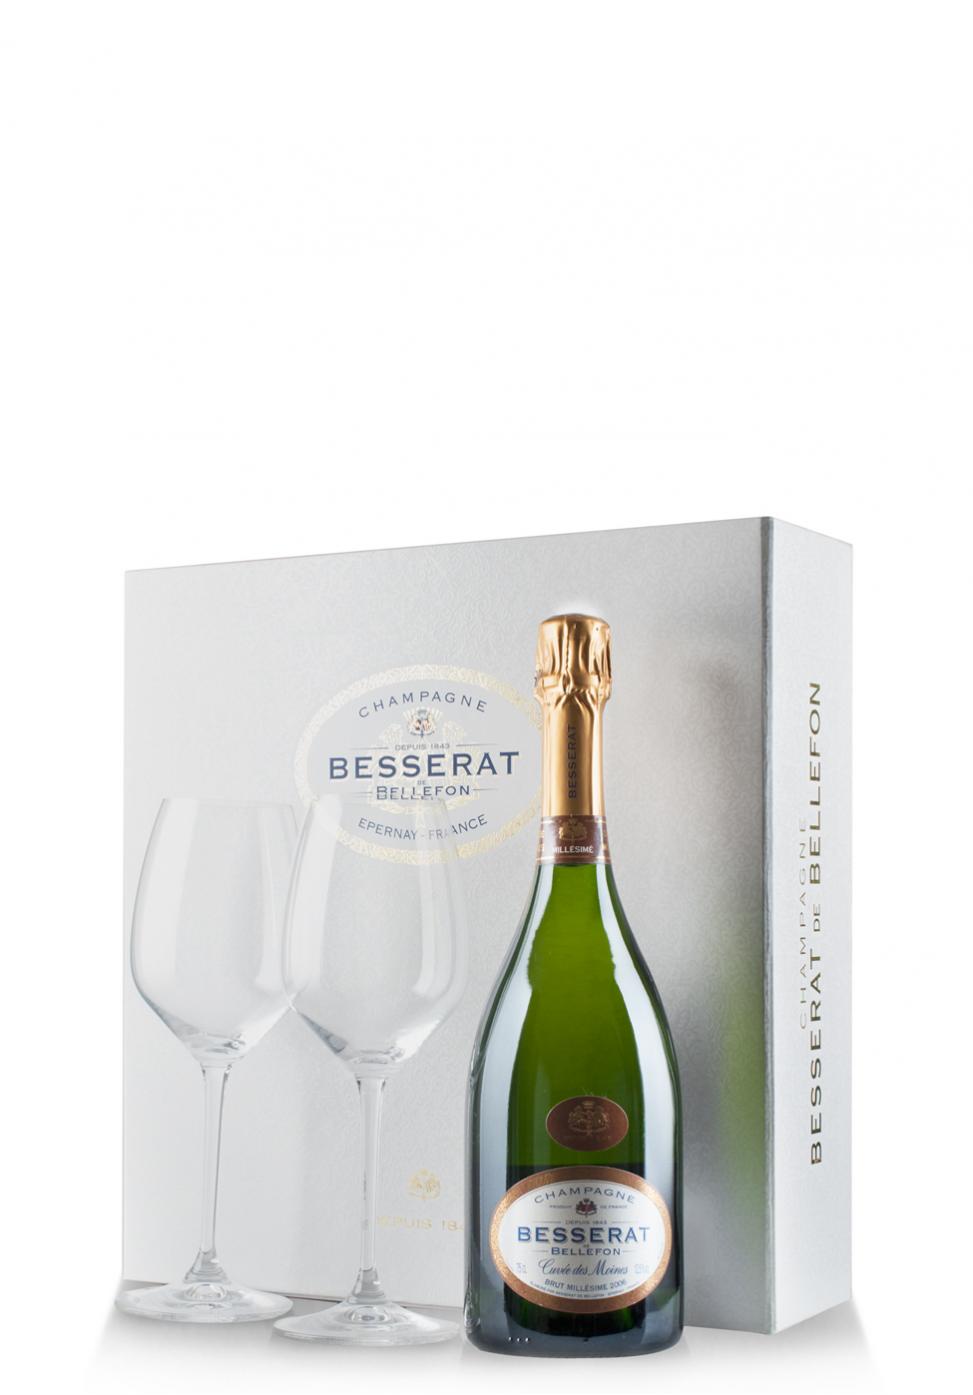 Set cadou Şampanie Besserat de Bellefon, Millesimé 2006, Brut (0.75L) + Cutie cadou cu 2 pahare Riedel